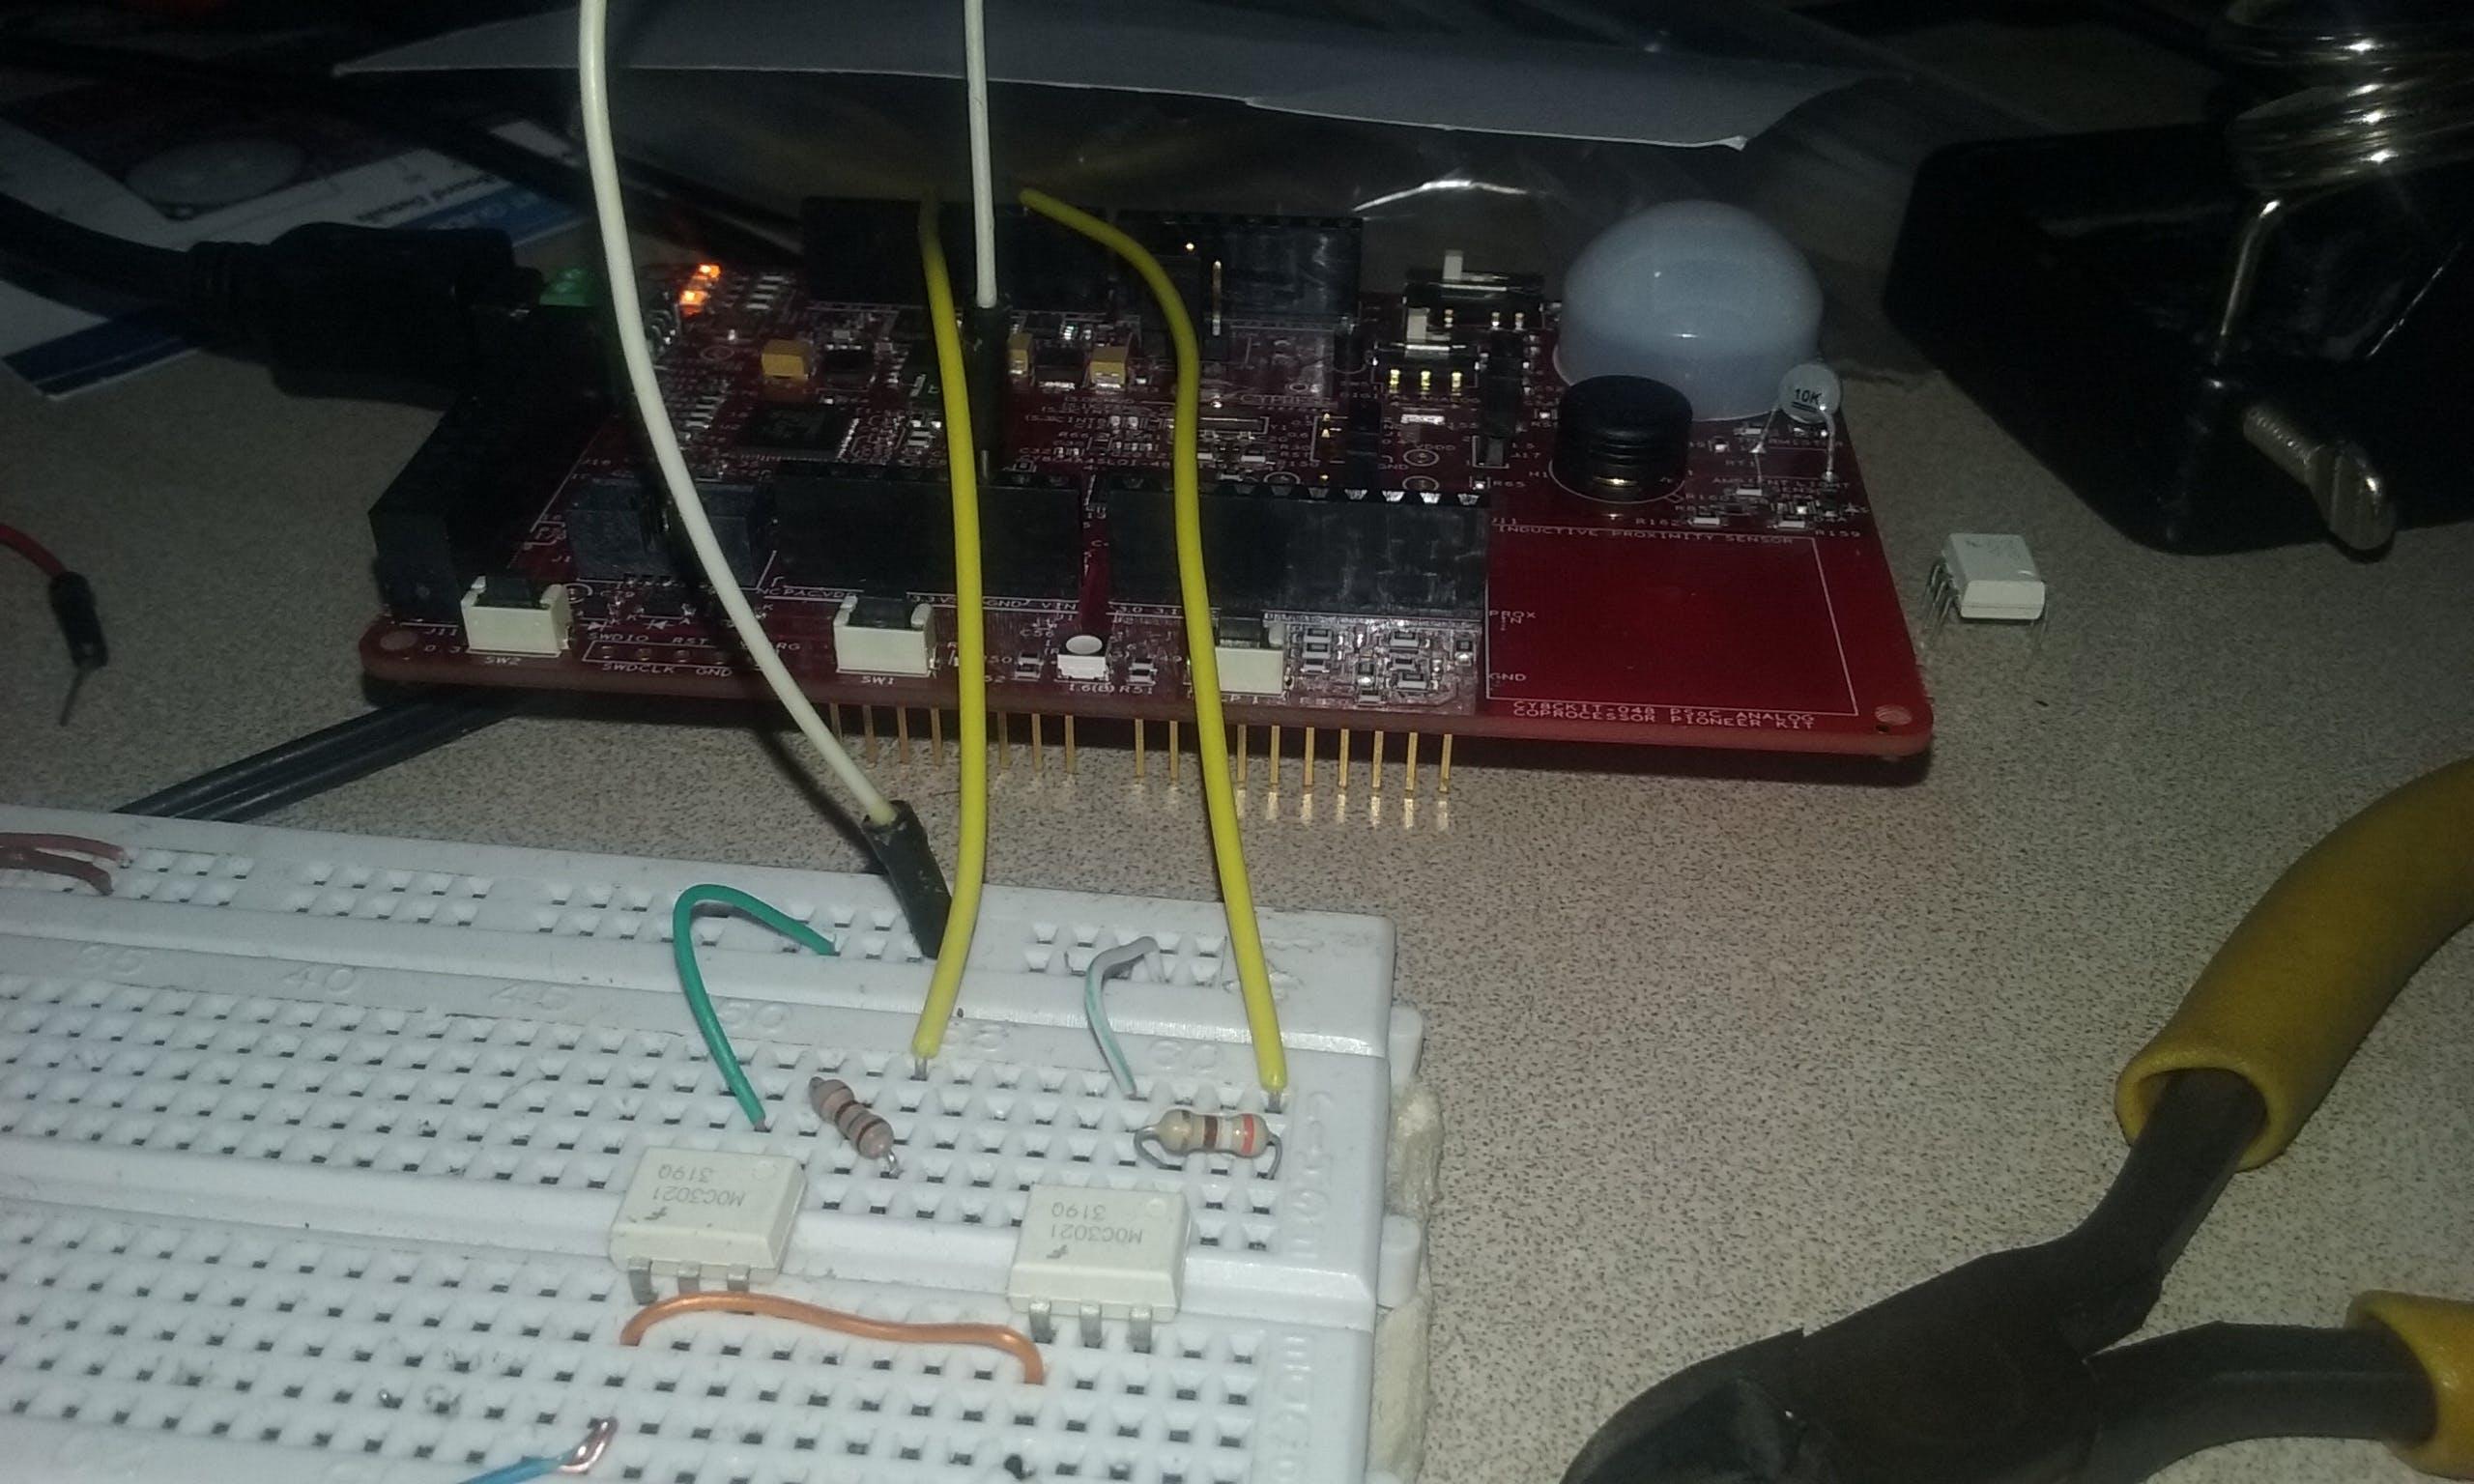 Opto-isolators circuits